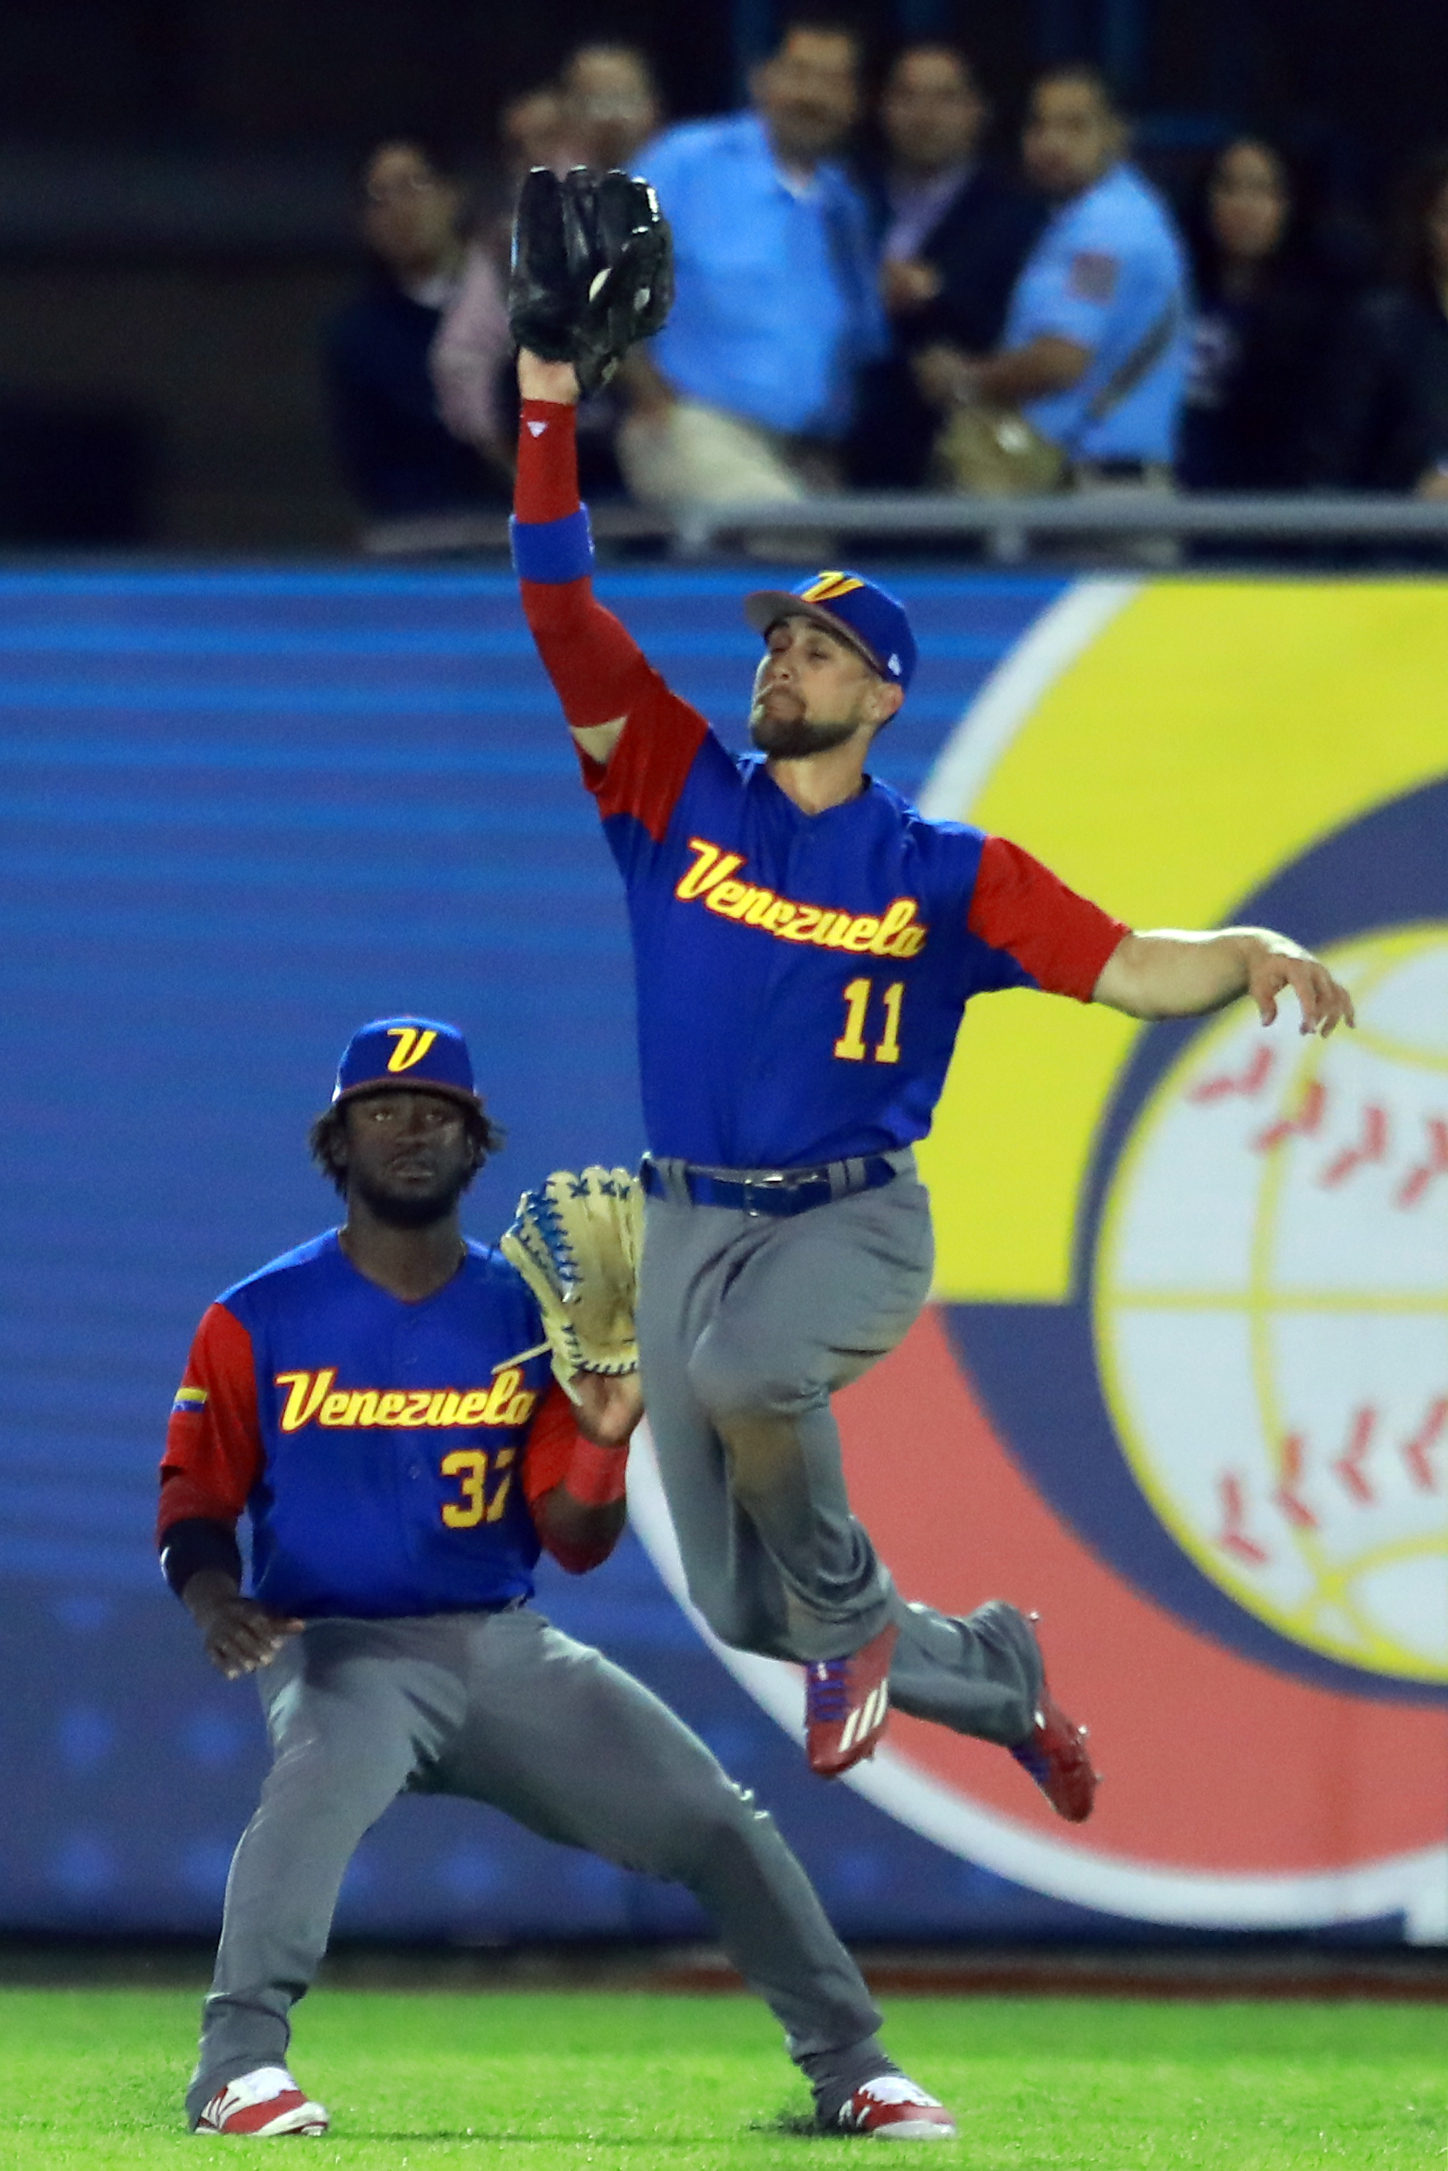 World Baseball Classic - Pool D - Game 2 - Venezuela v Puerto Rico